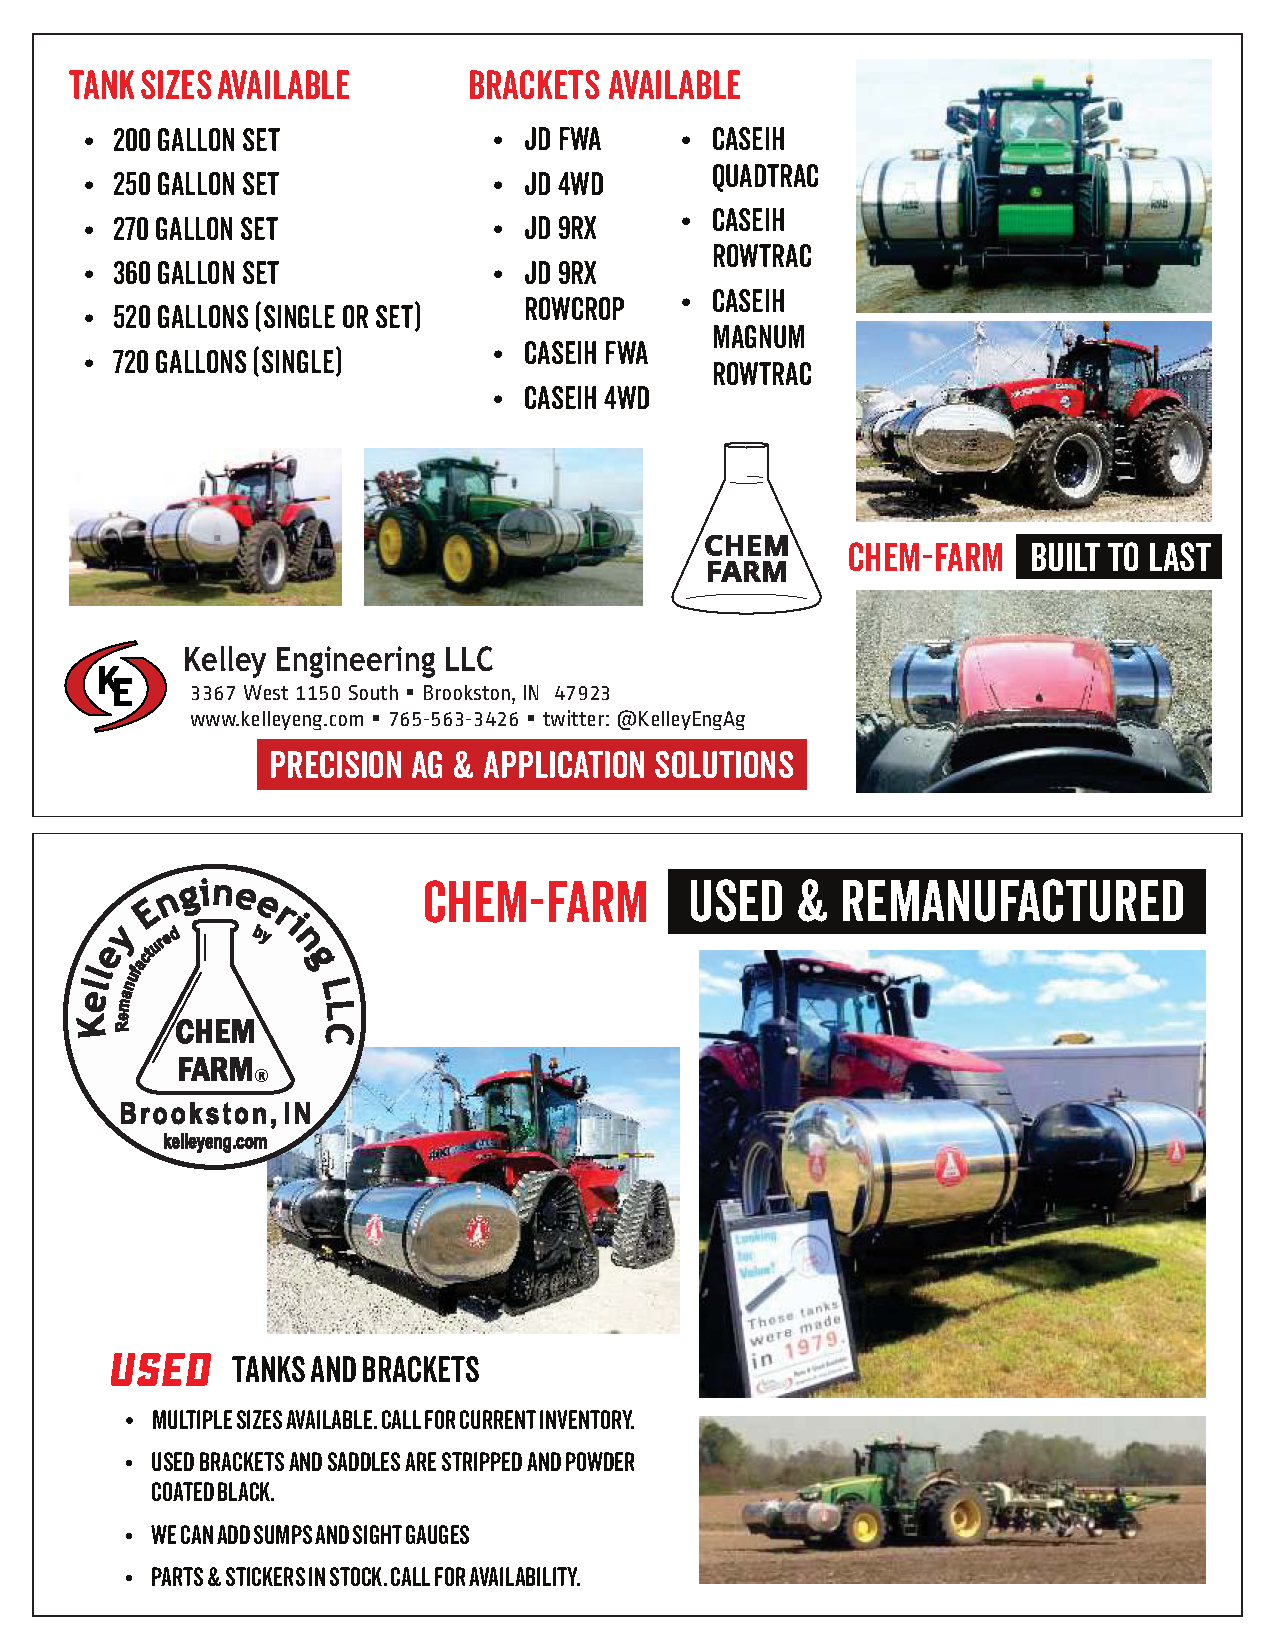 Chem-Farm New and Used Postcard